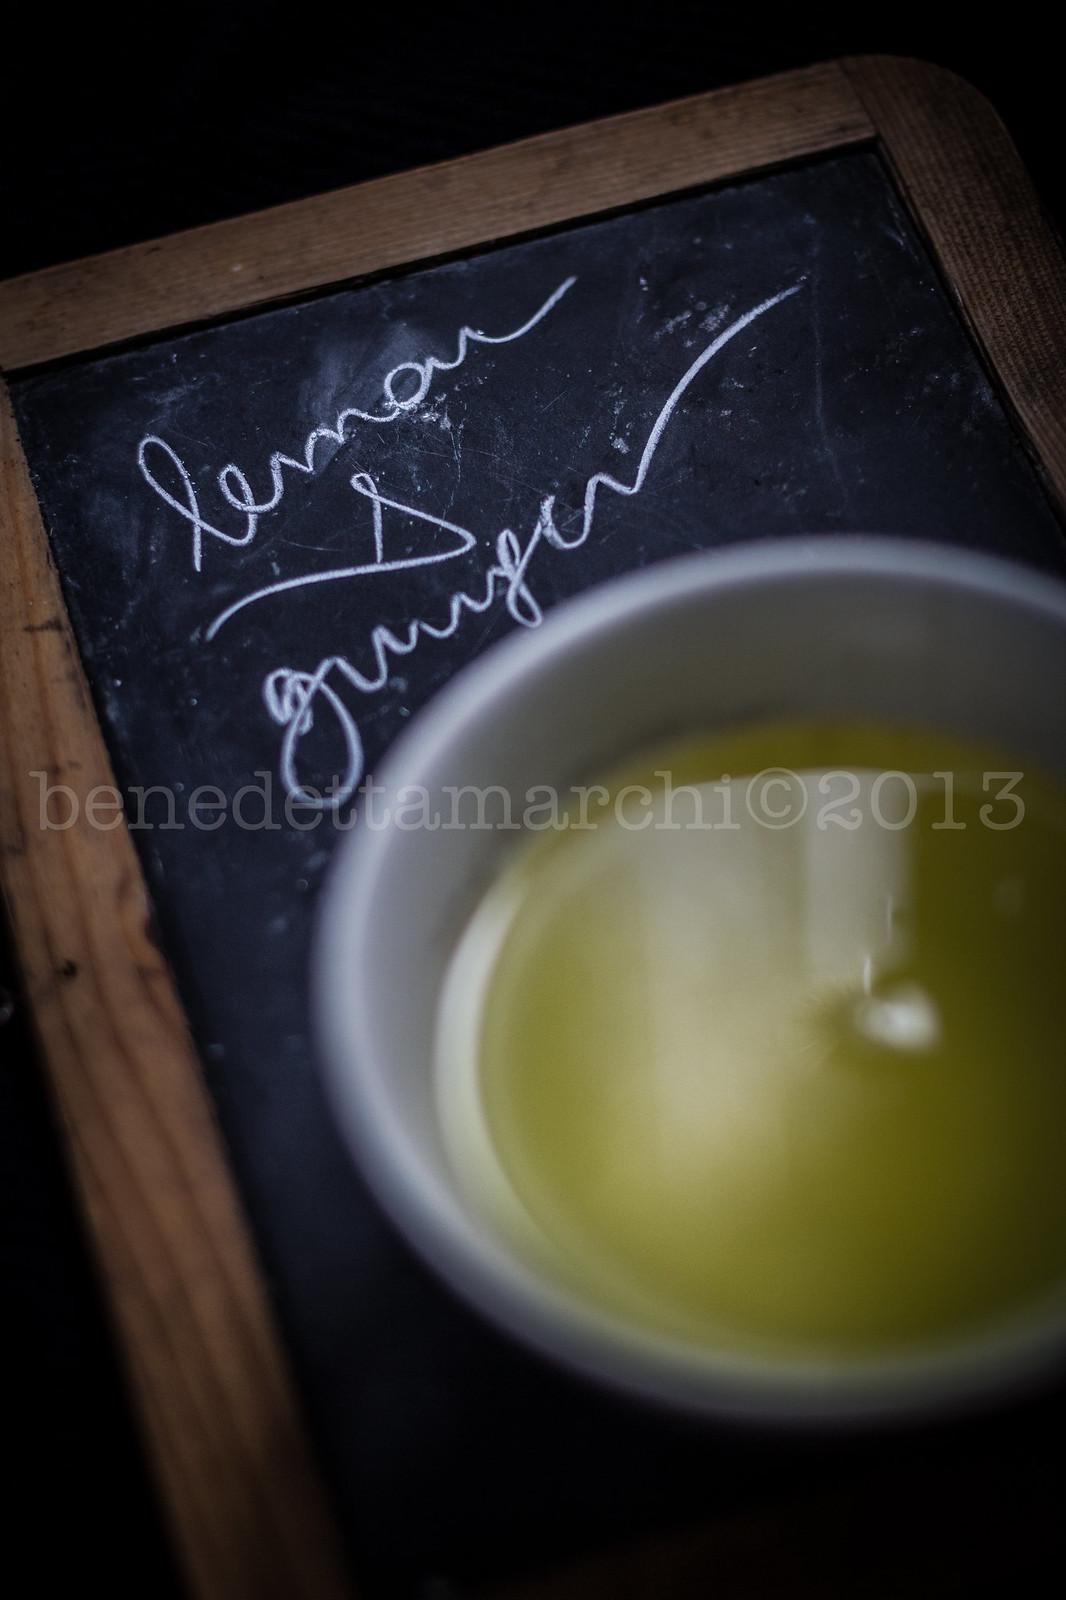 tisana limone e zenzero fashion flavors-1-2